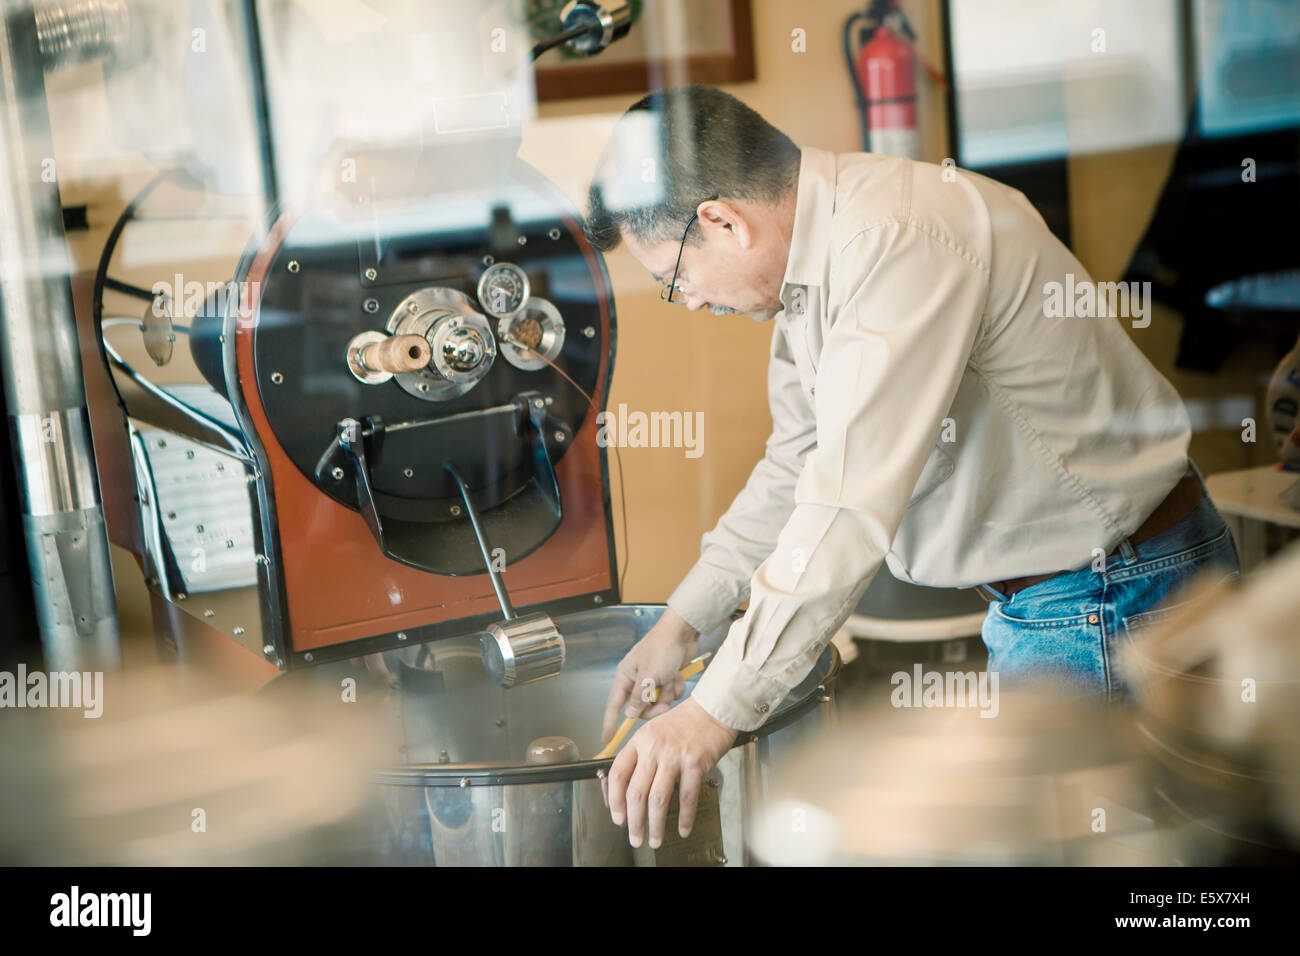 Mature man using coffee roasting machine in cafe - Stock Image